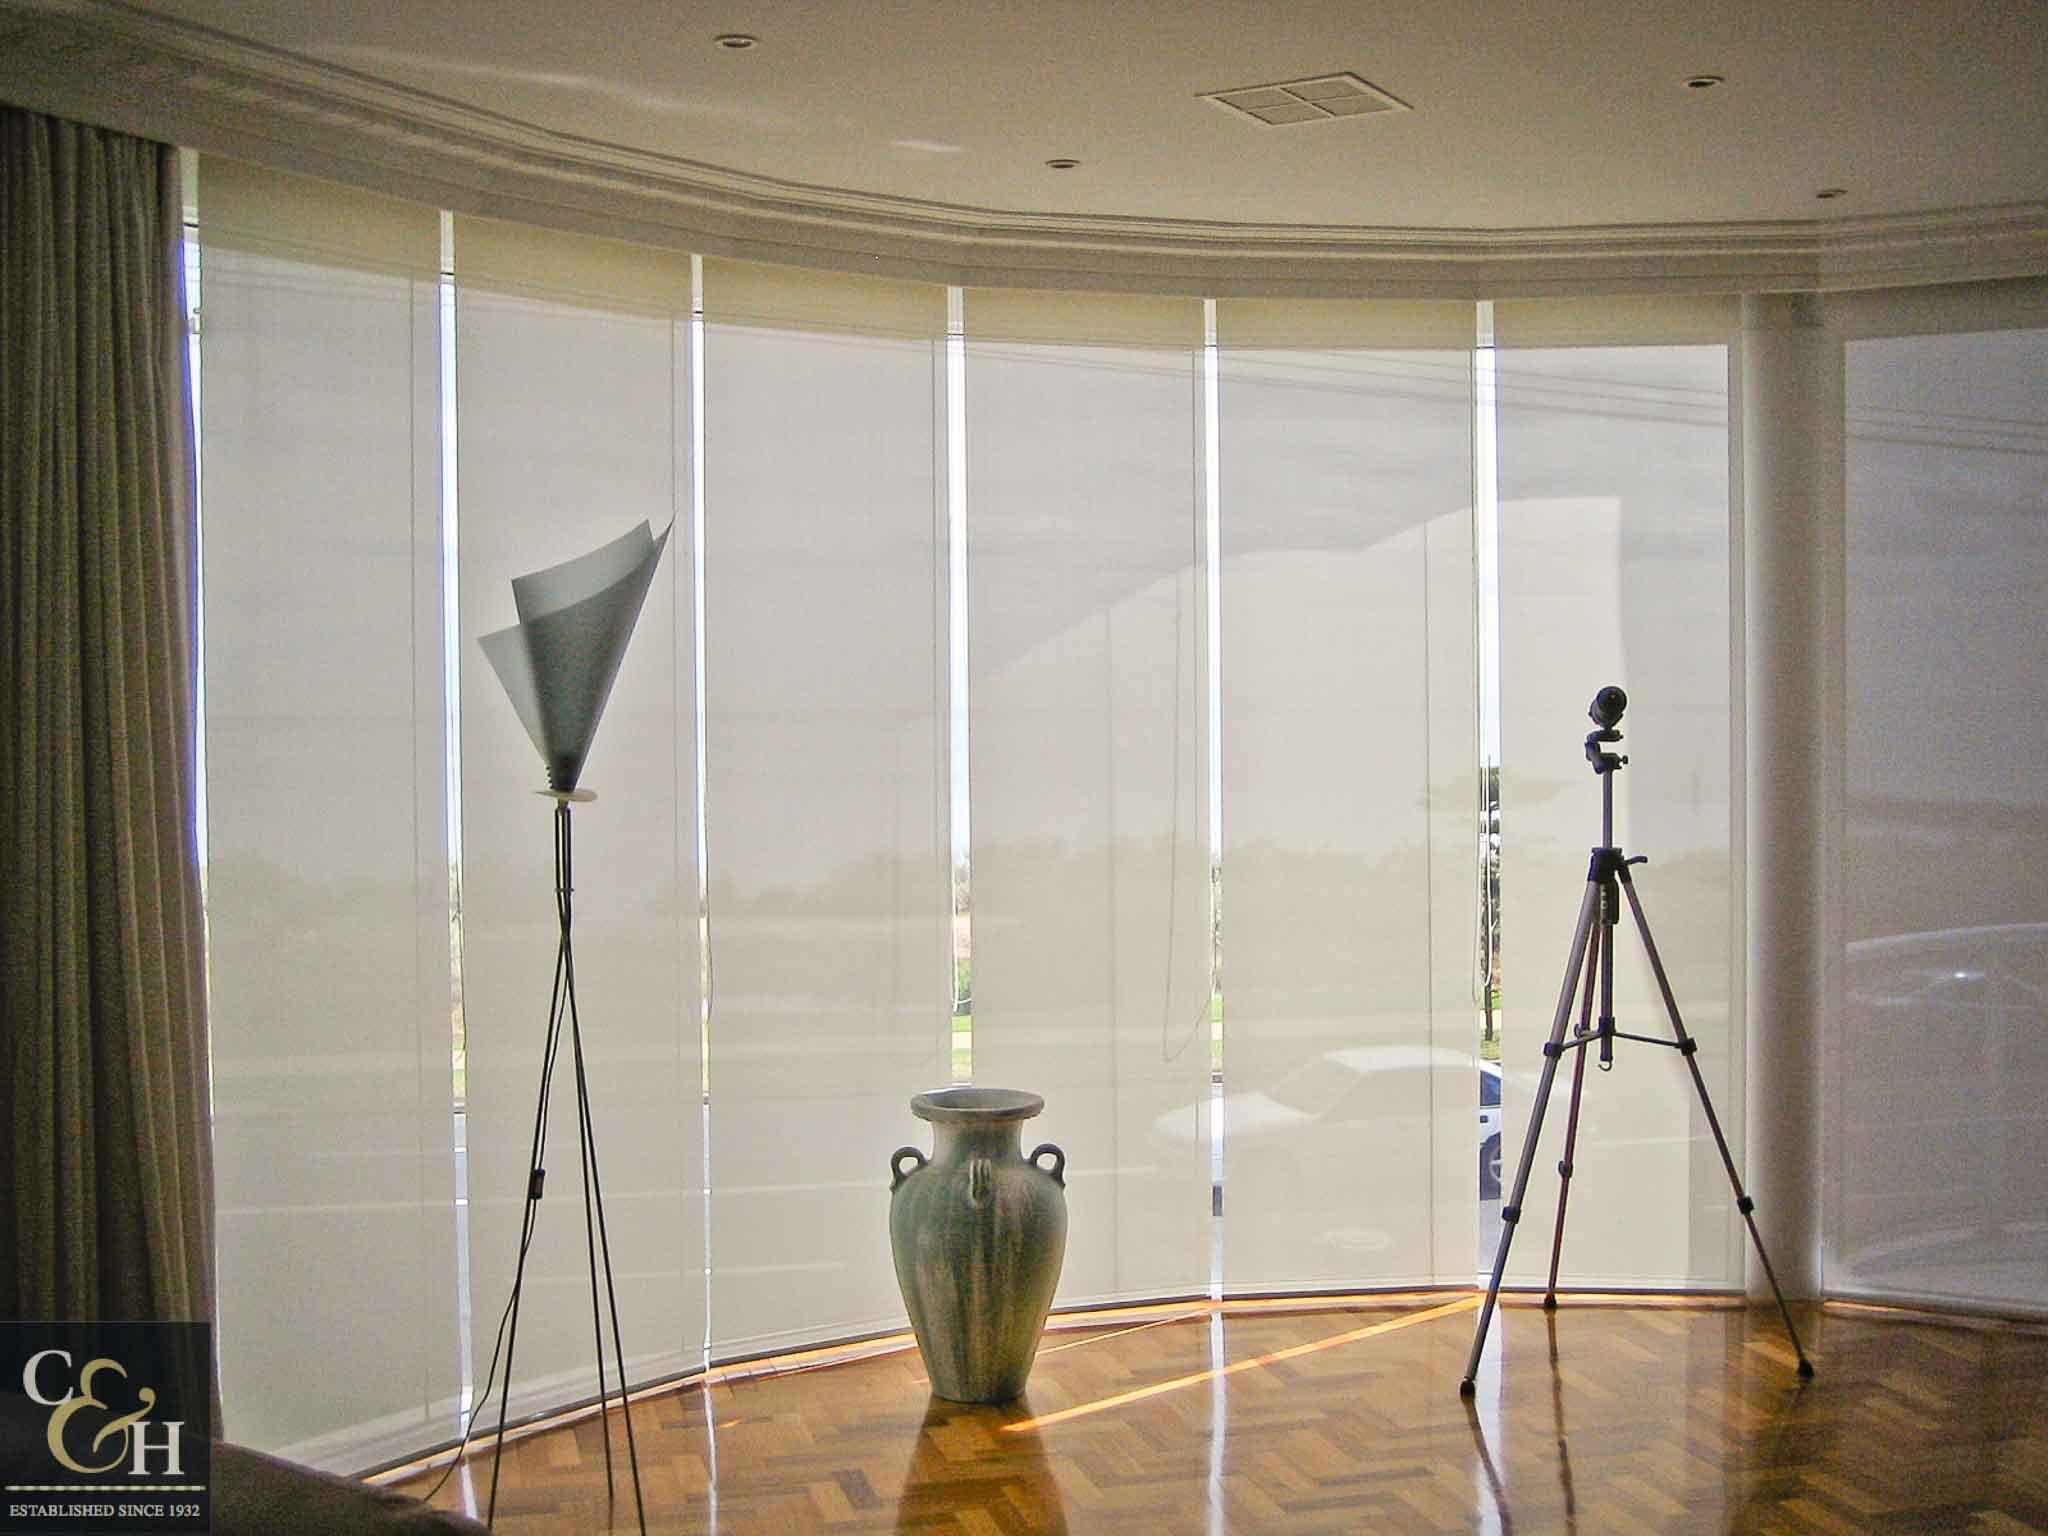 Screen-Roller-Blinds- 21 inside a living room